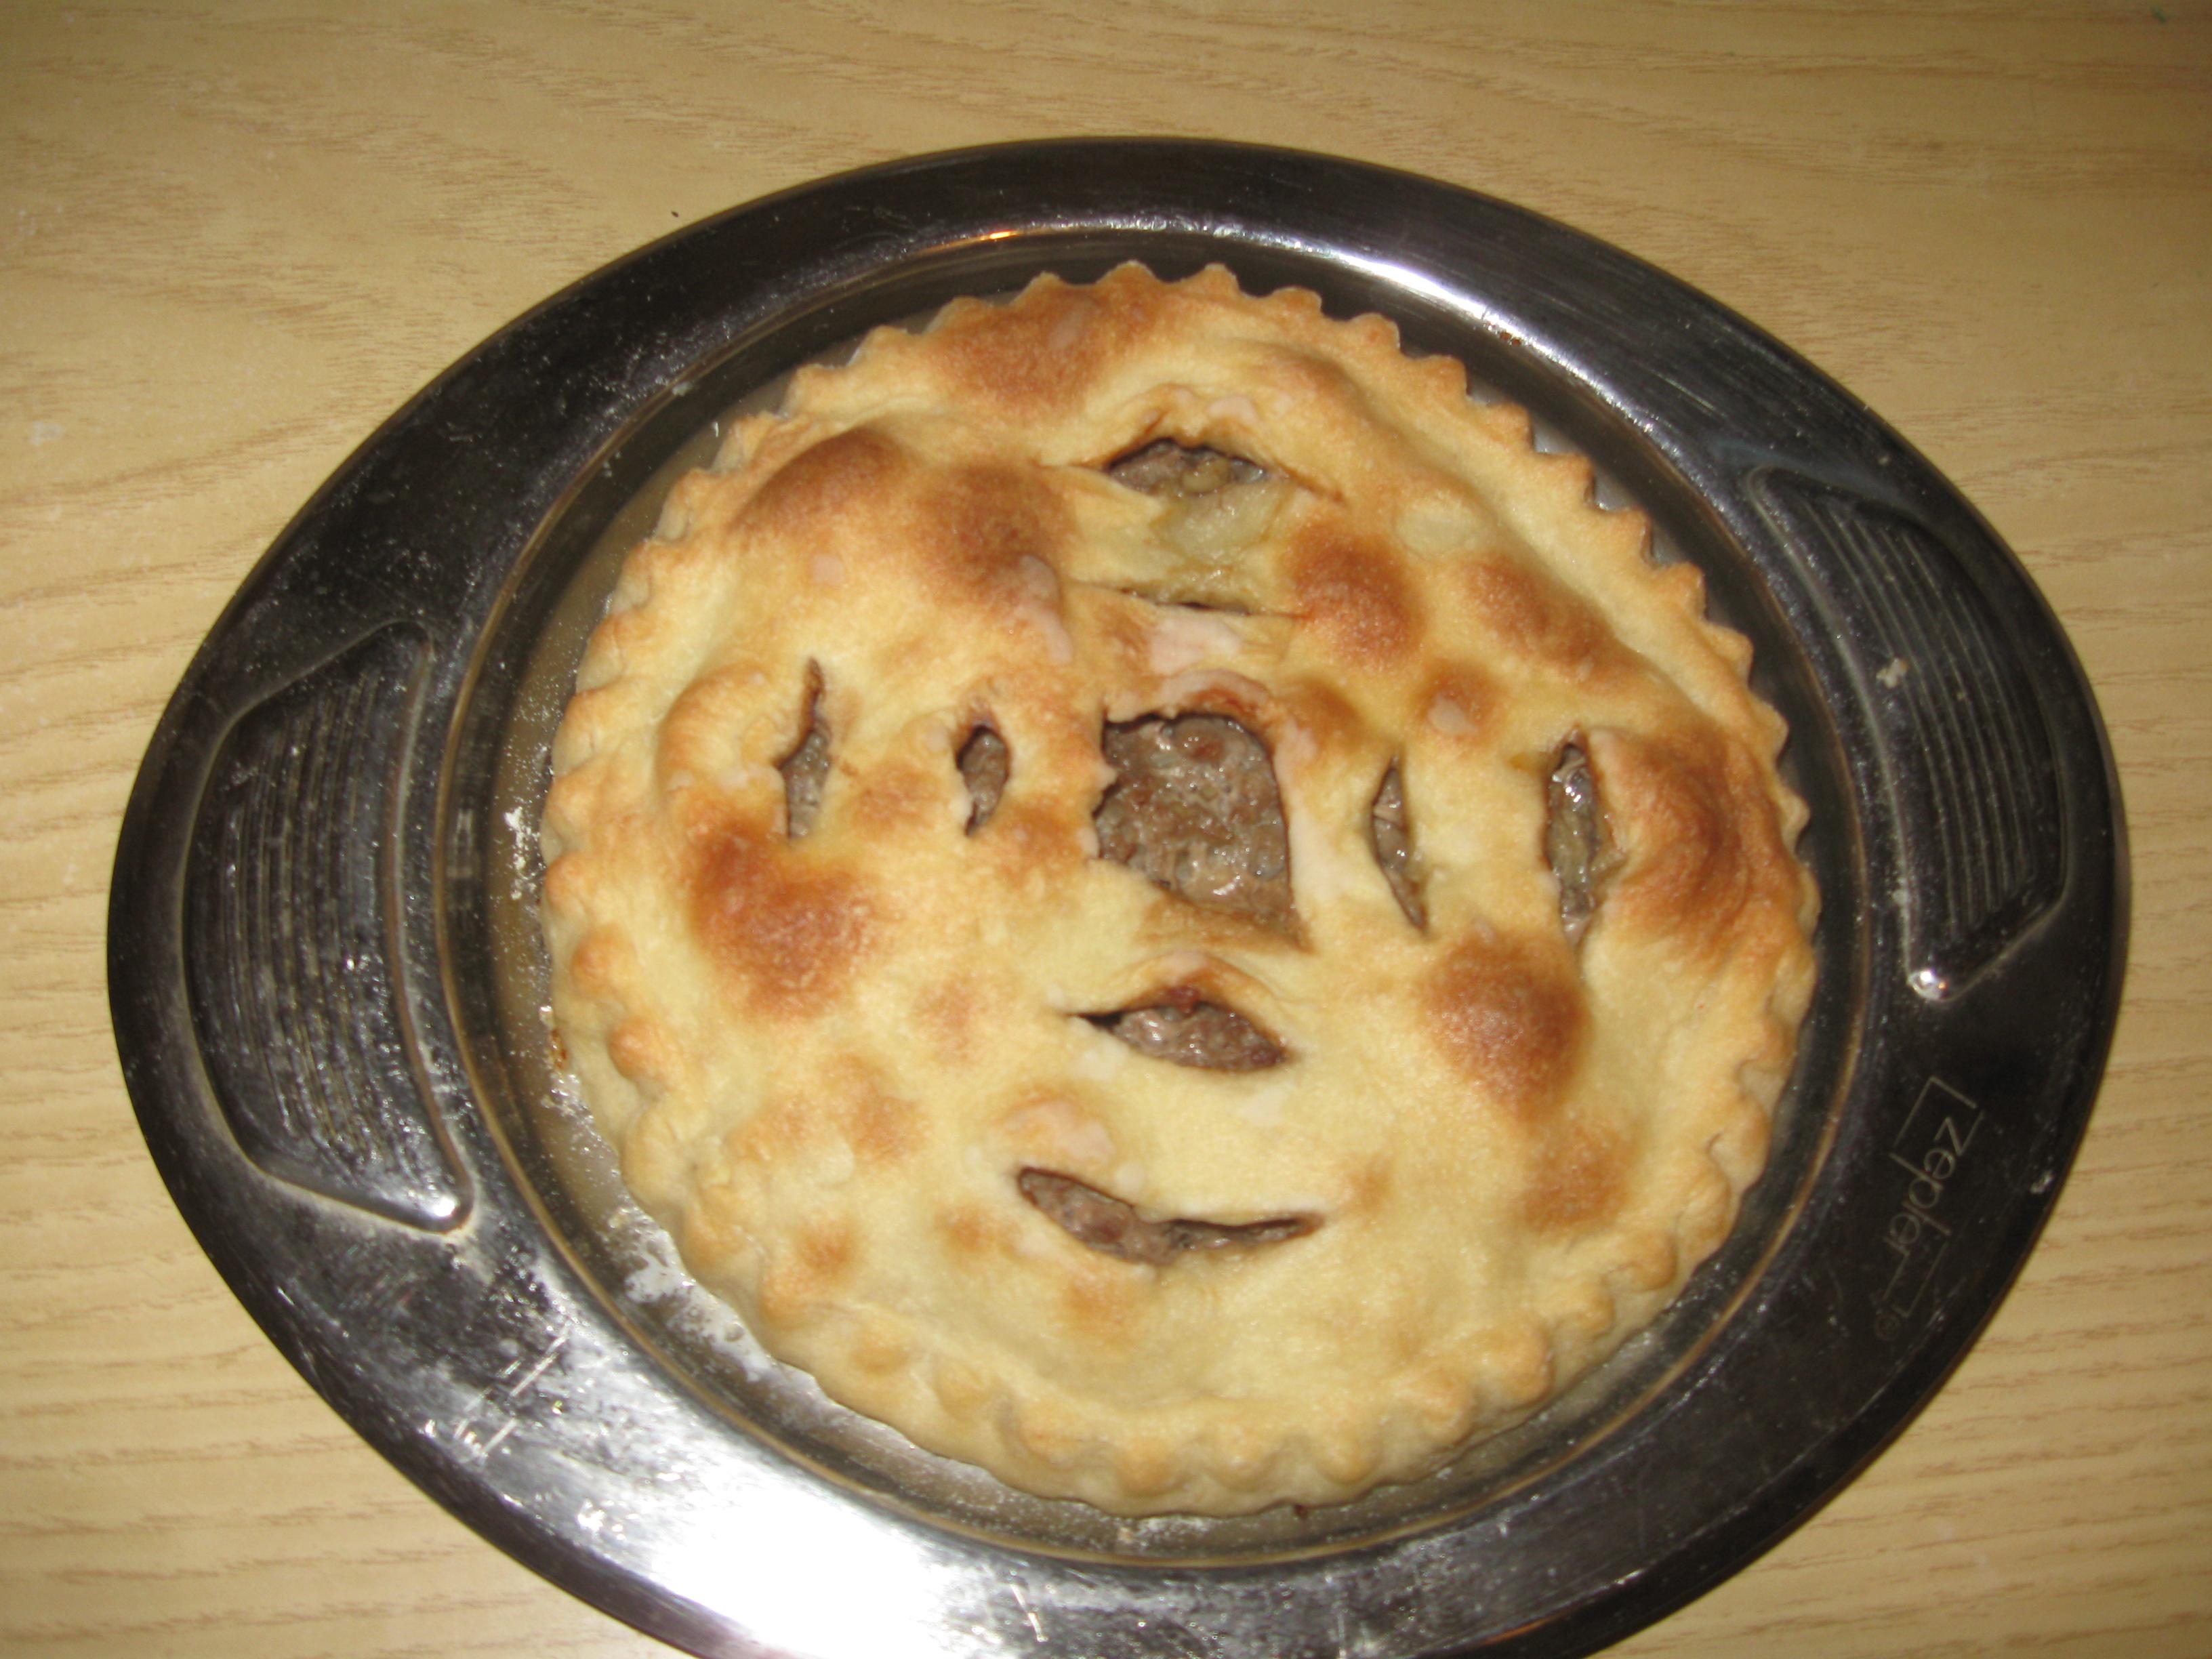 Фото осетинского пирога с мясом в домашних условиях